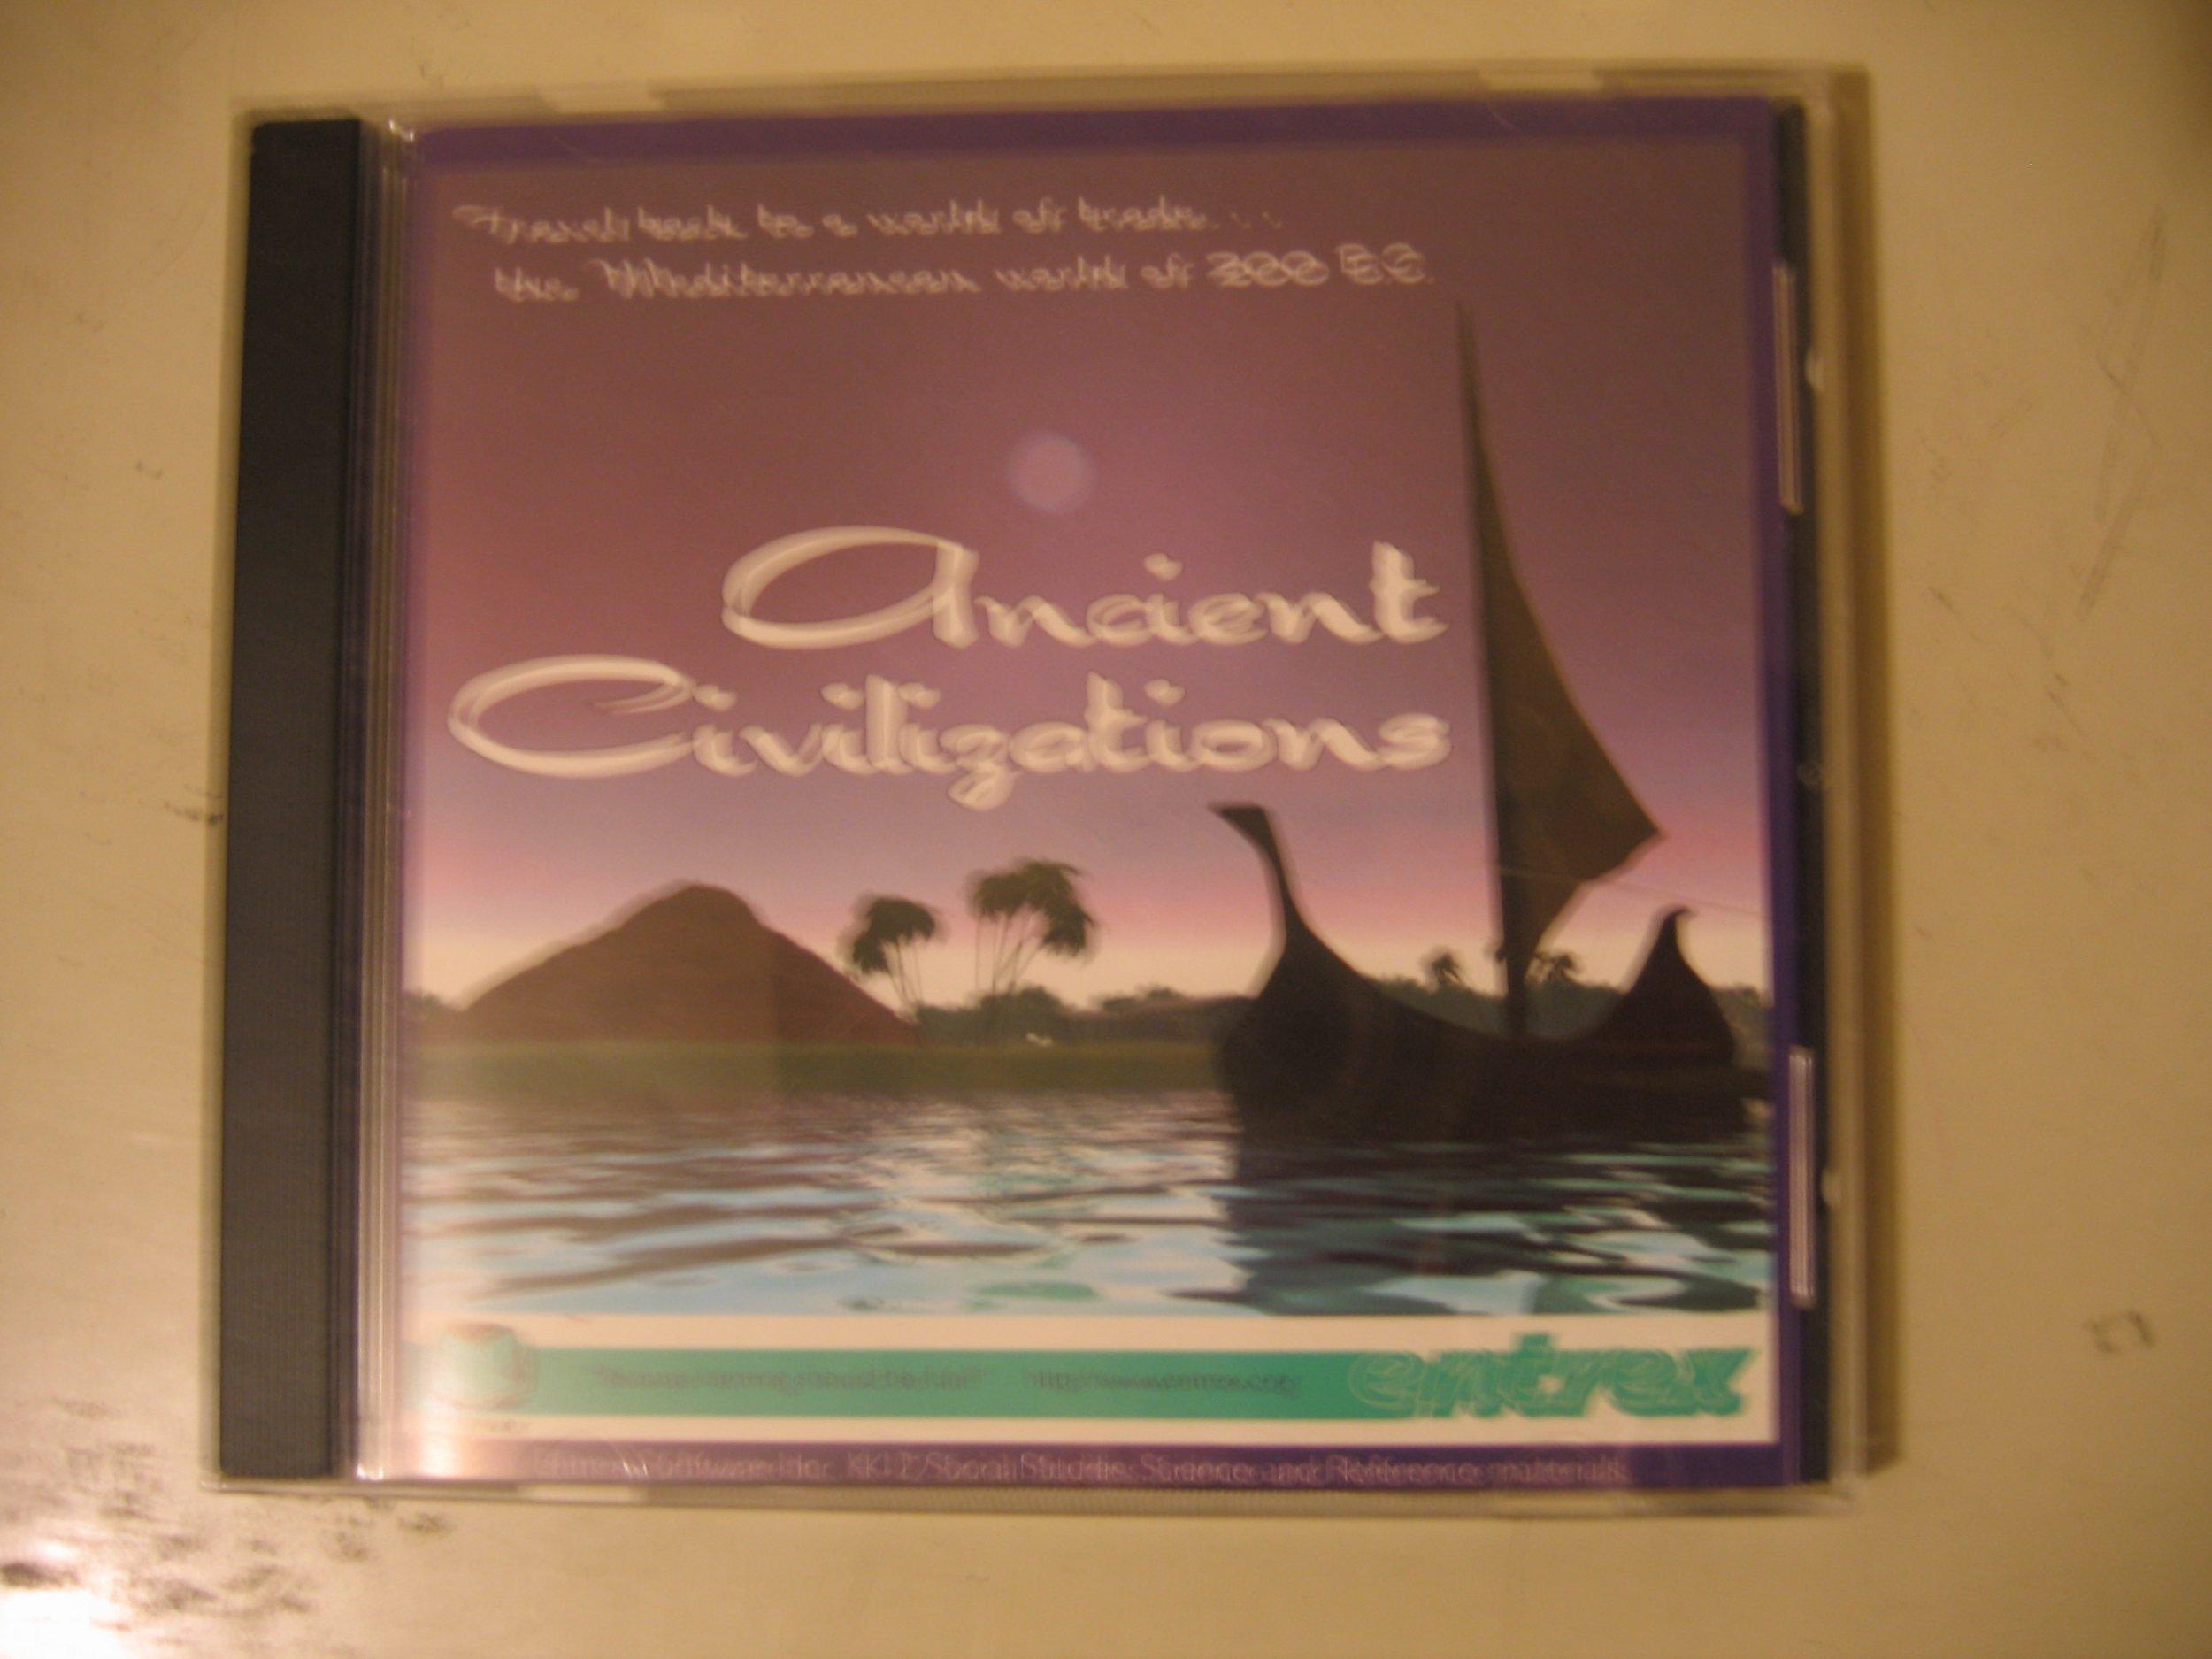 Ancient Civilzations by Entrex